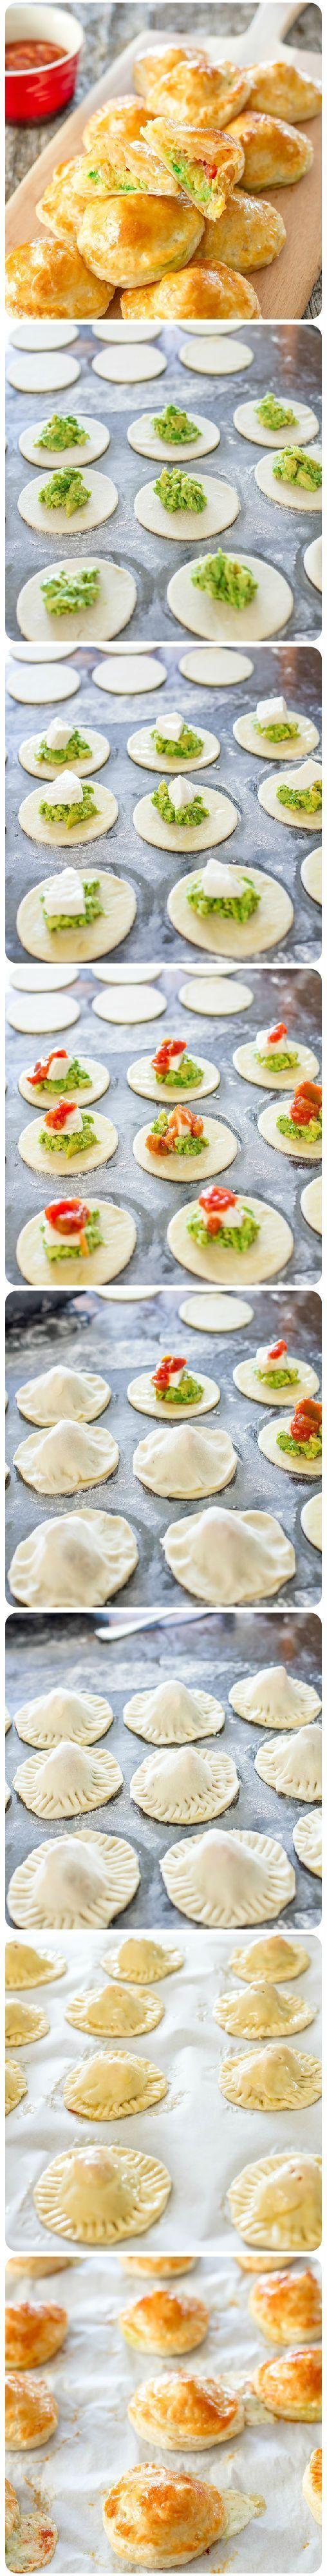 vulling van avocado, mozzarella en gerookte zalm